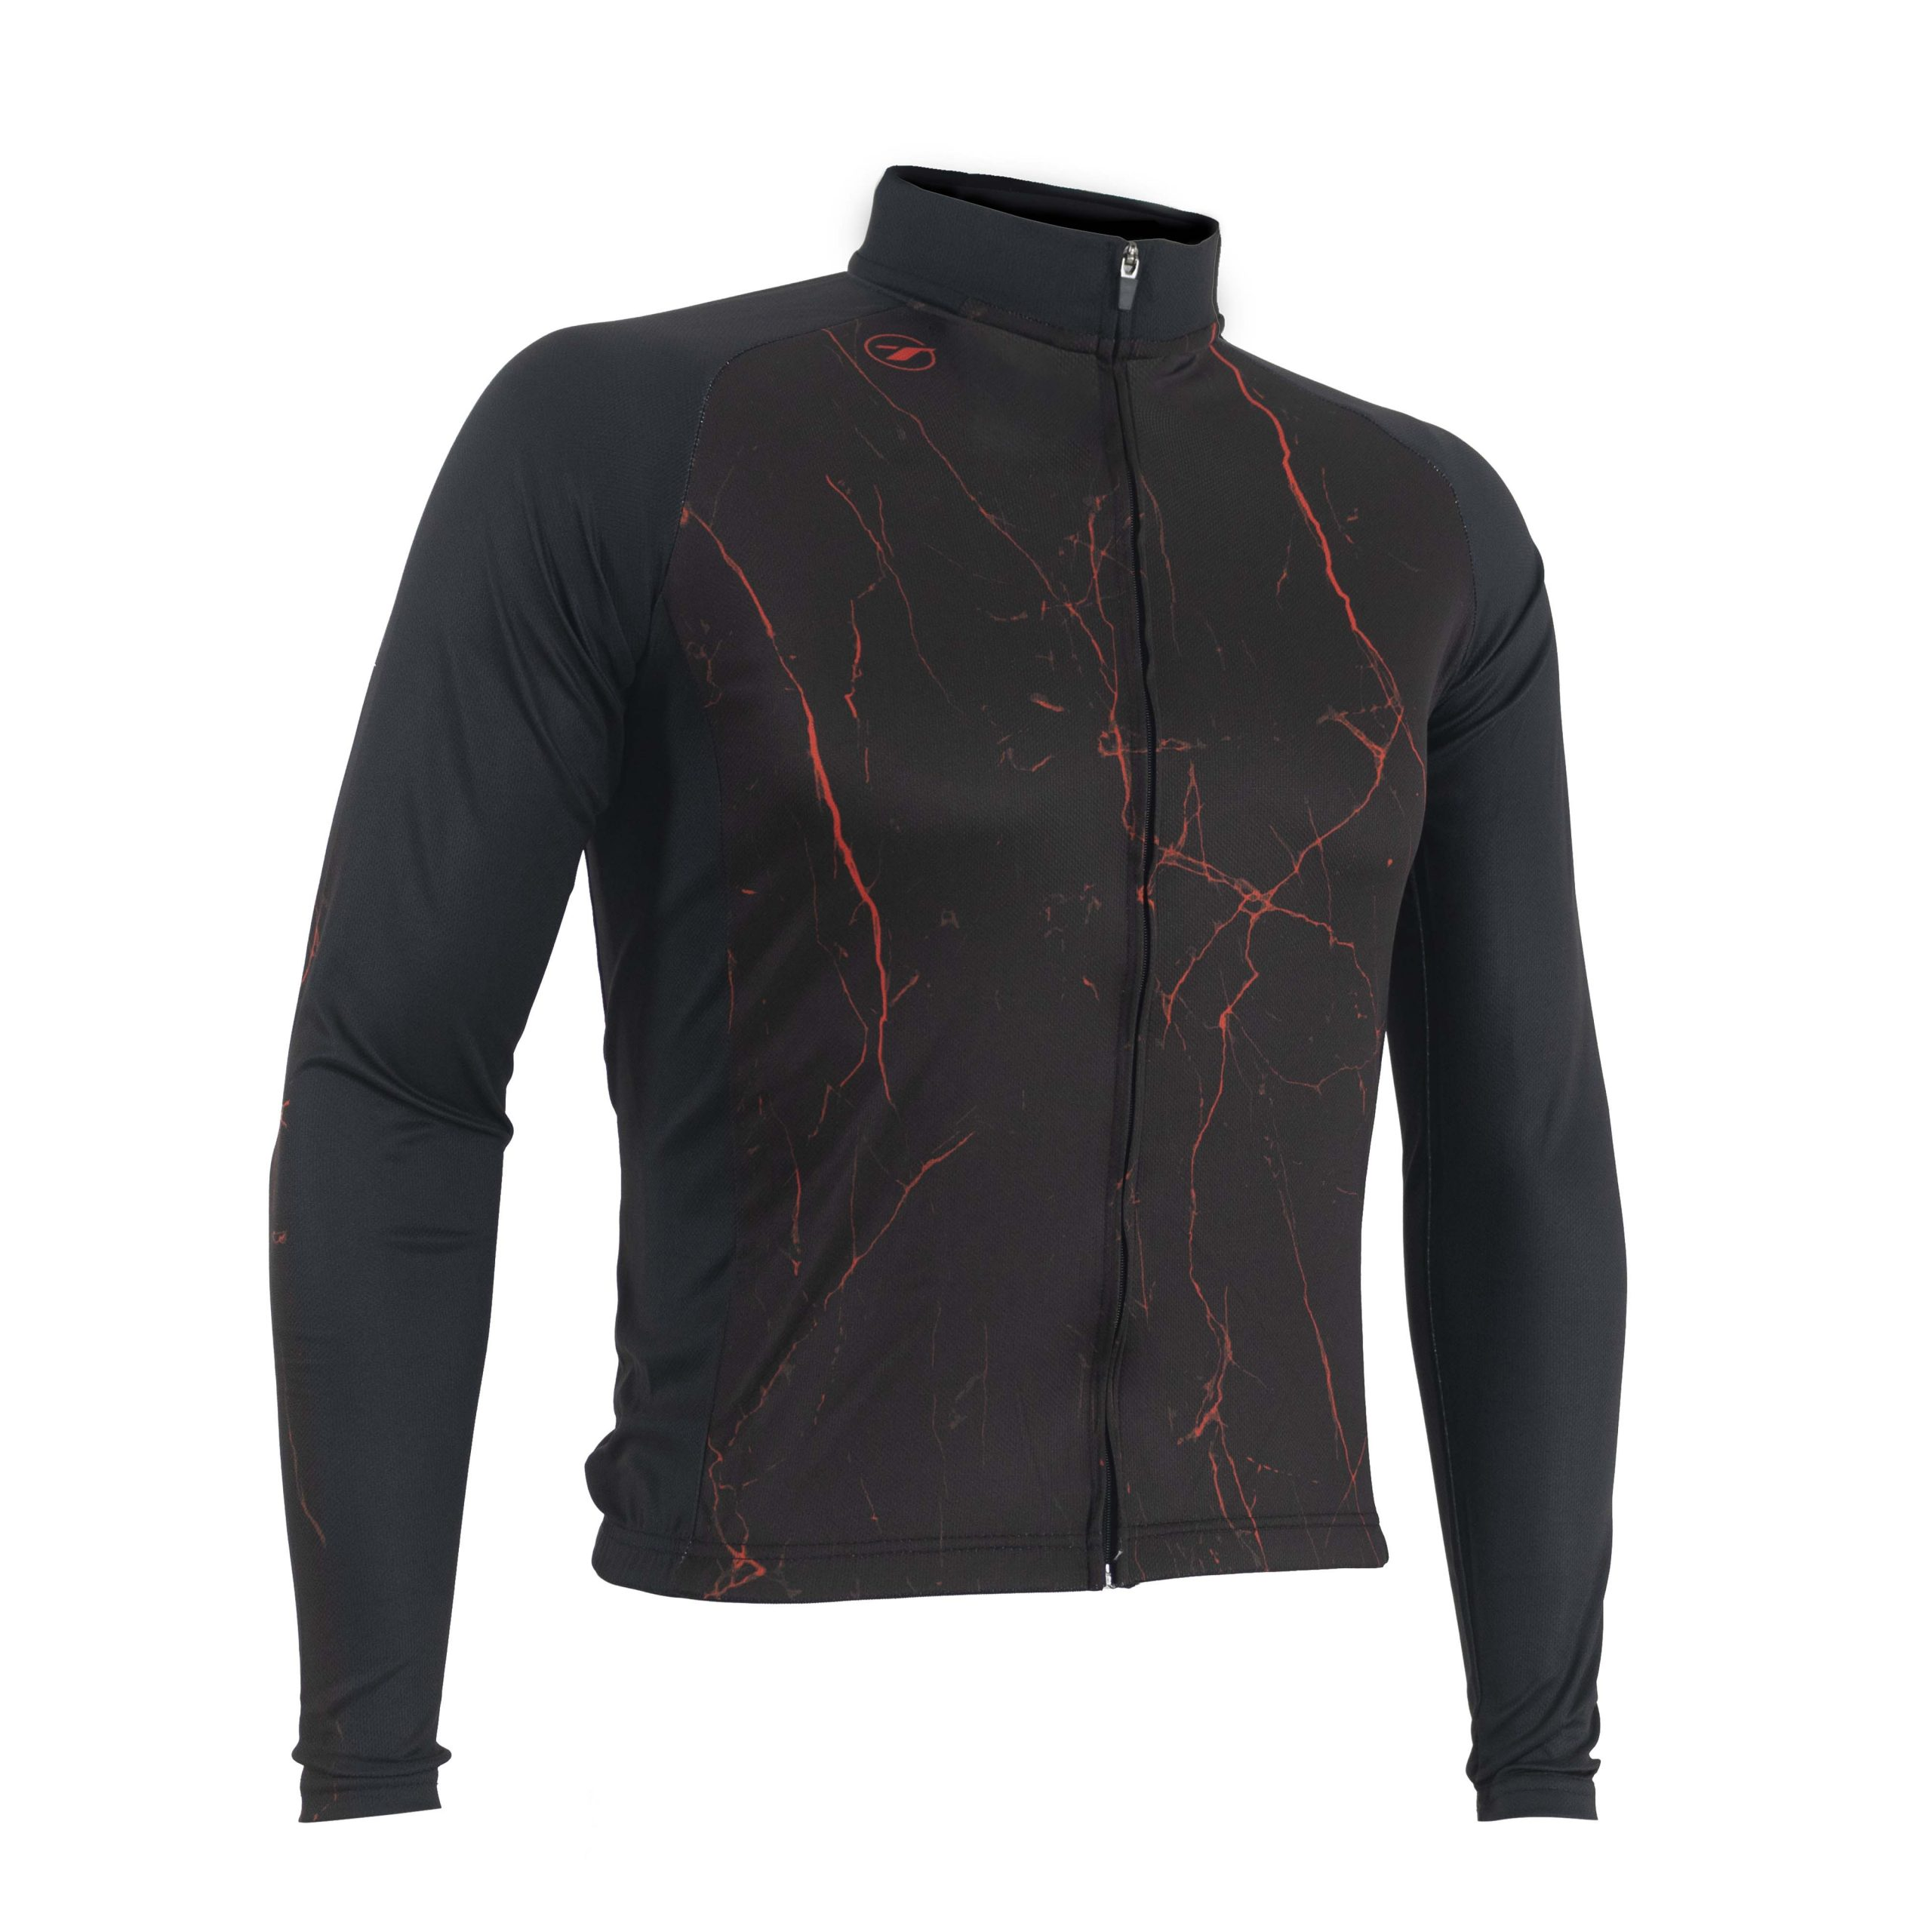 Camisa manga longa para ciclismo STORM | PRO LINE 3